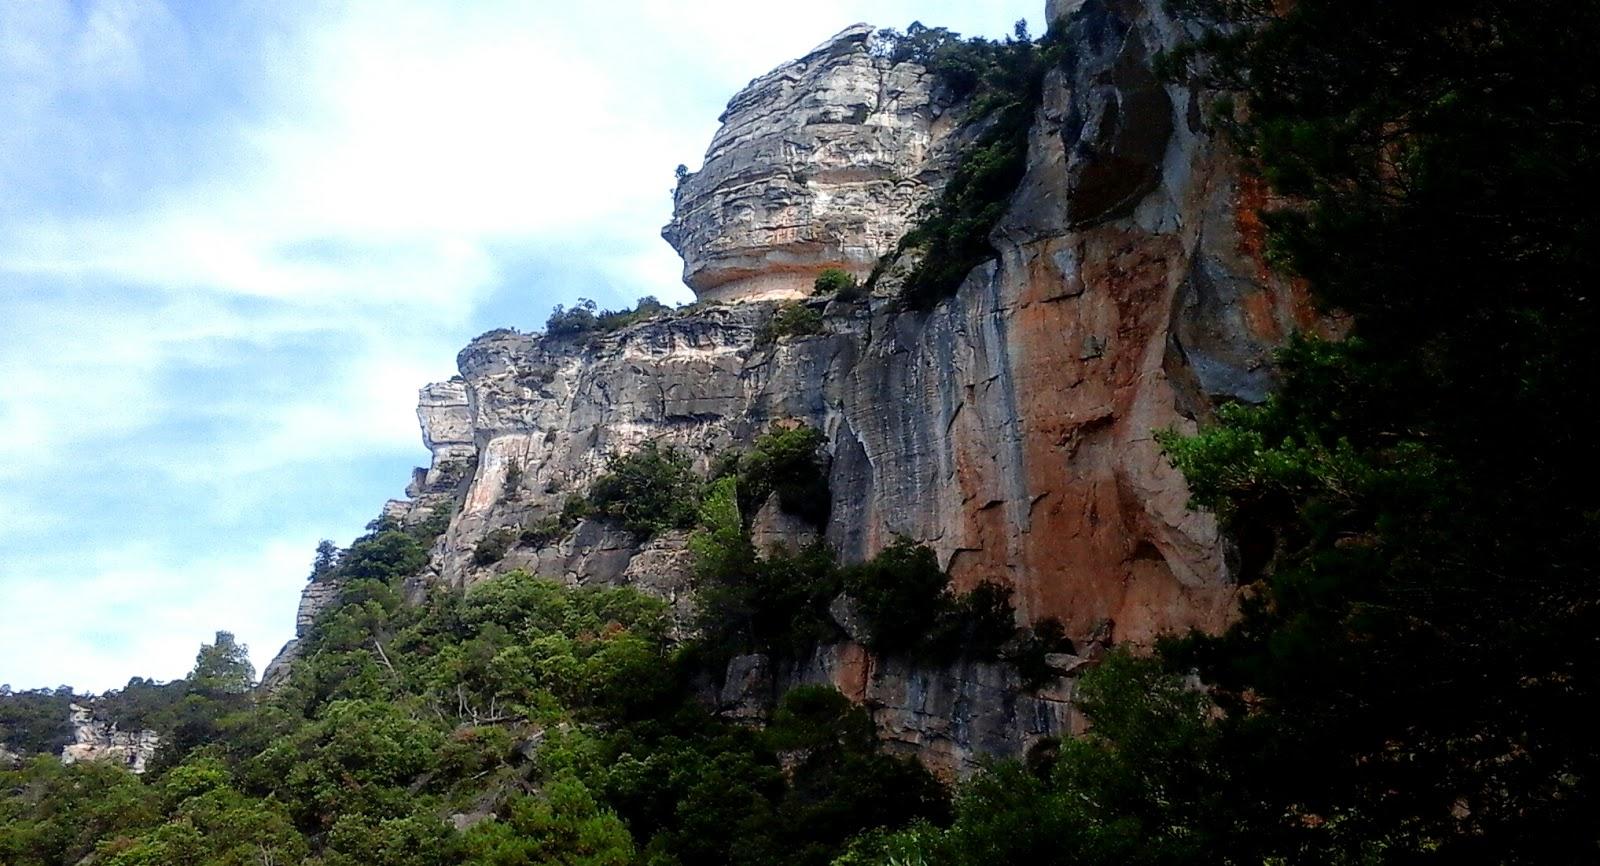 Roca catalana.